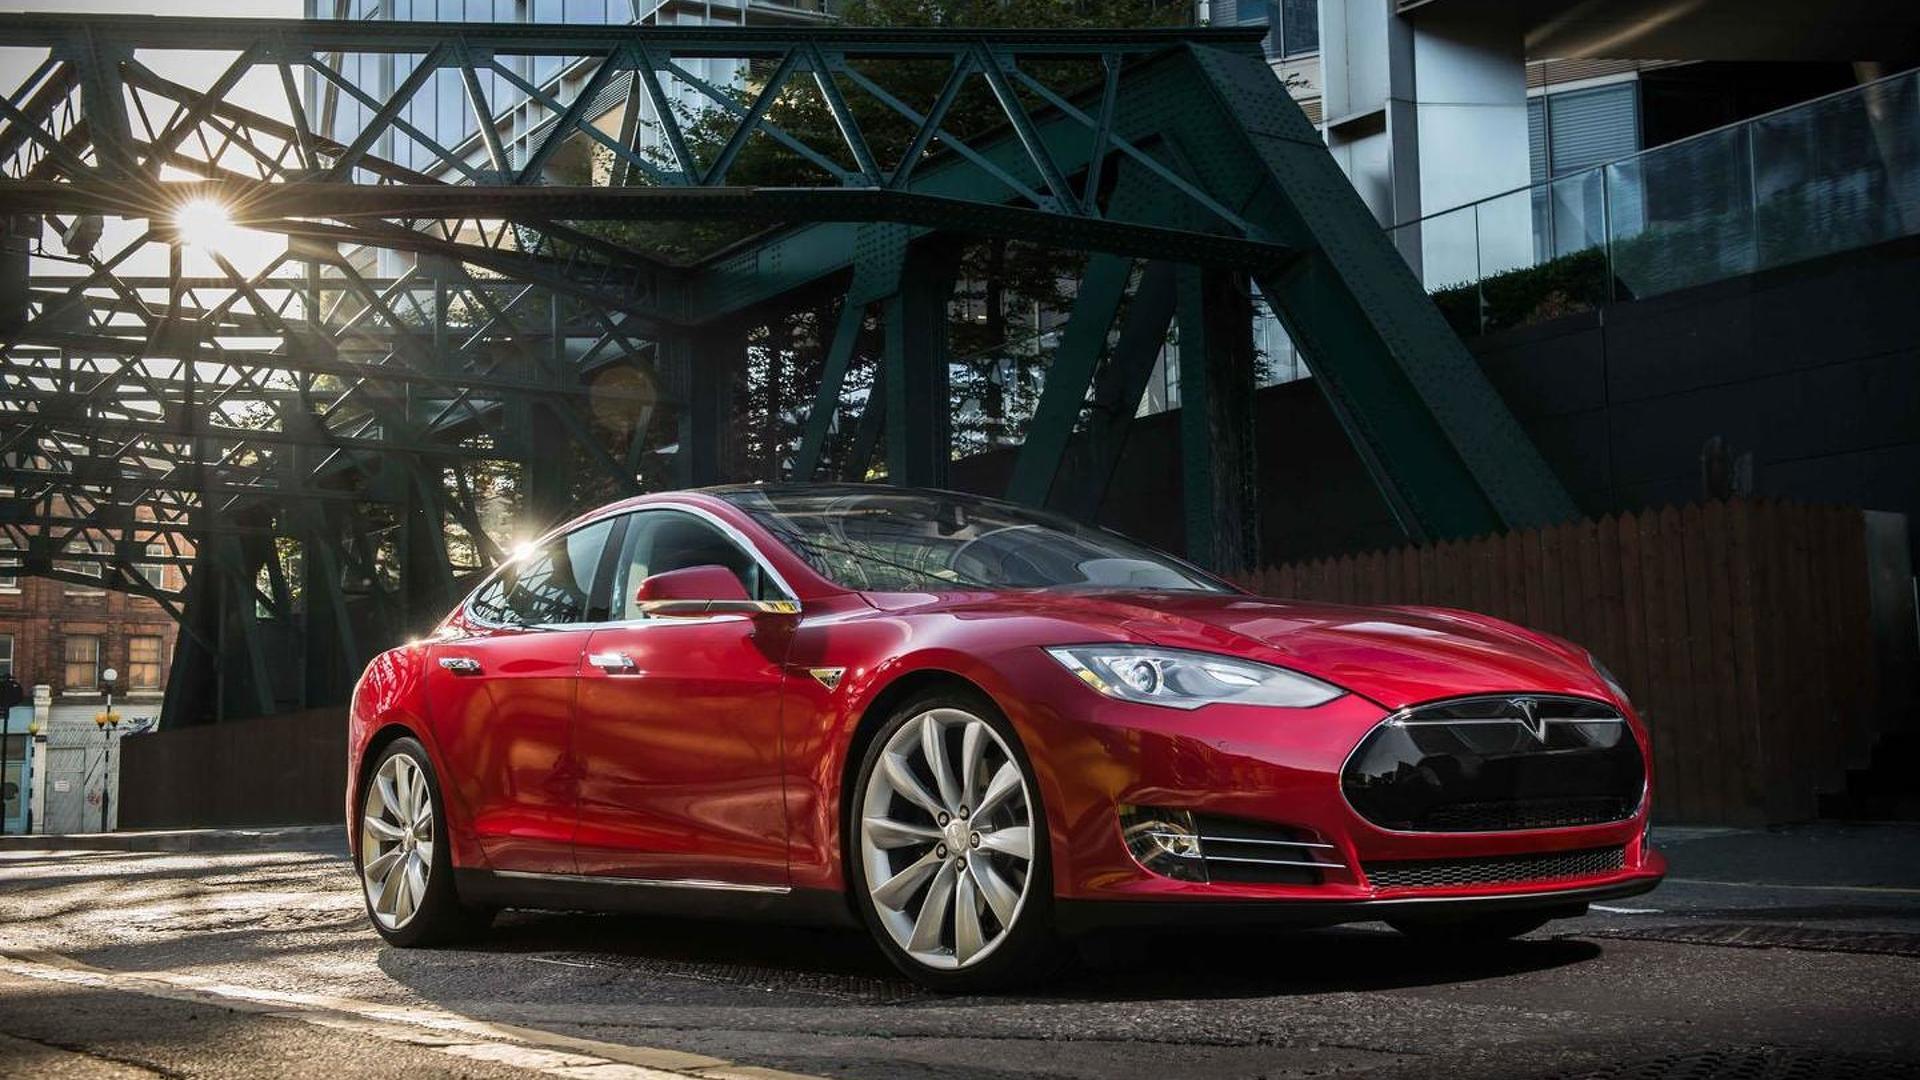 Germany wants to ban petrol & diesel models by 2050